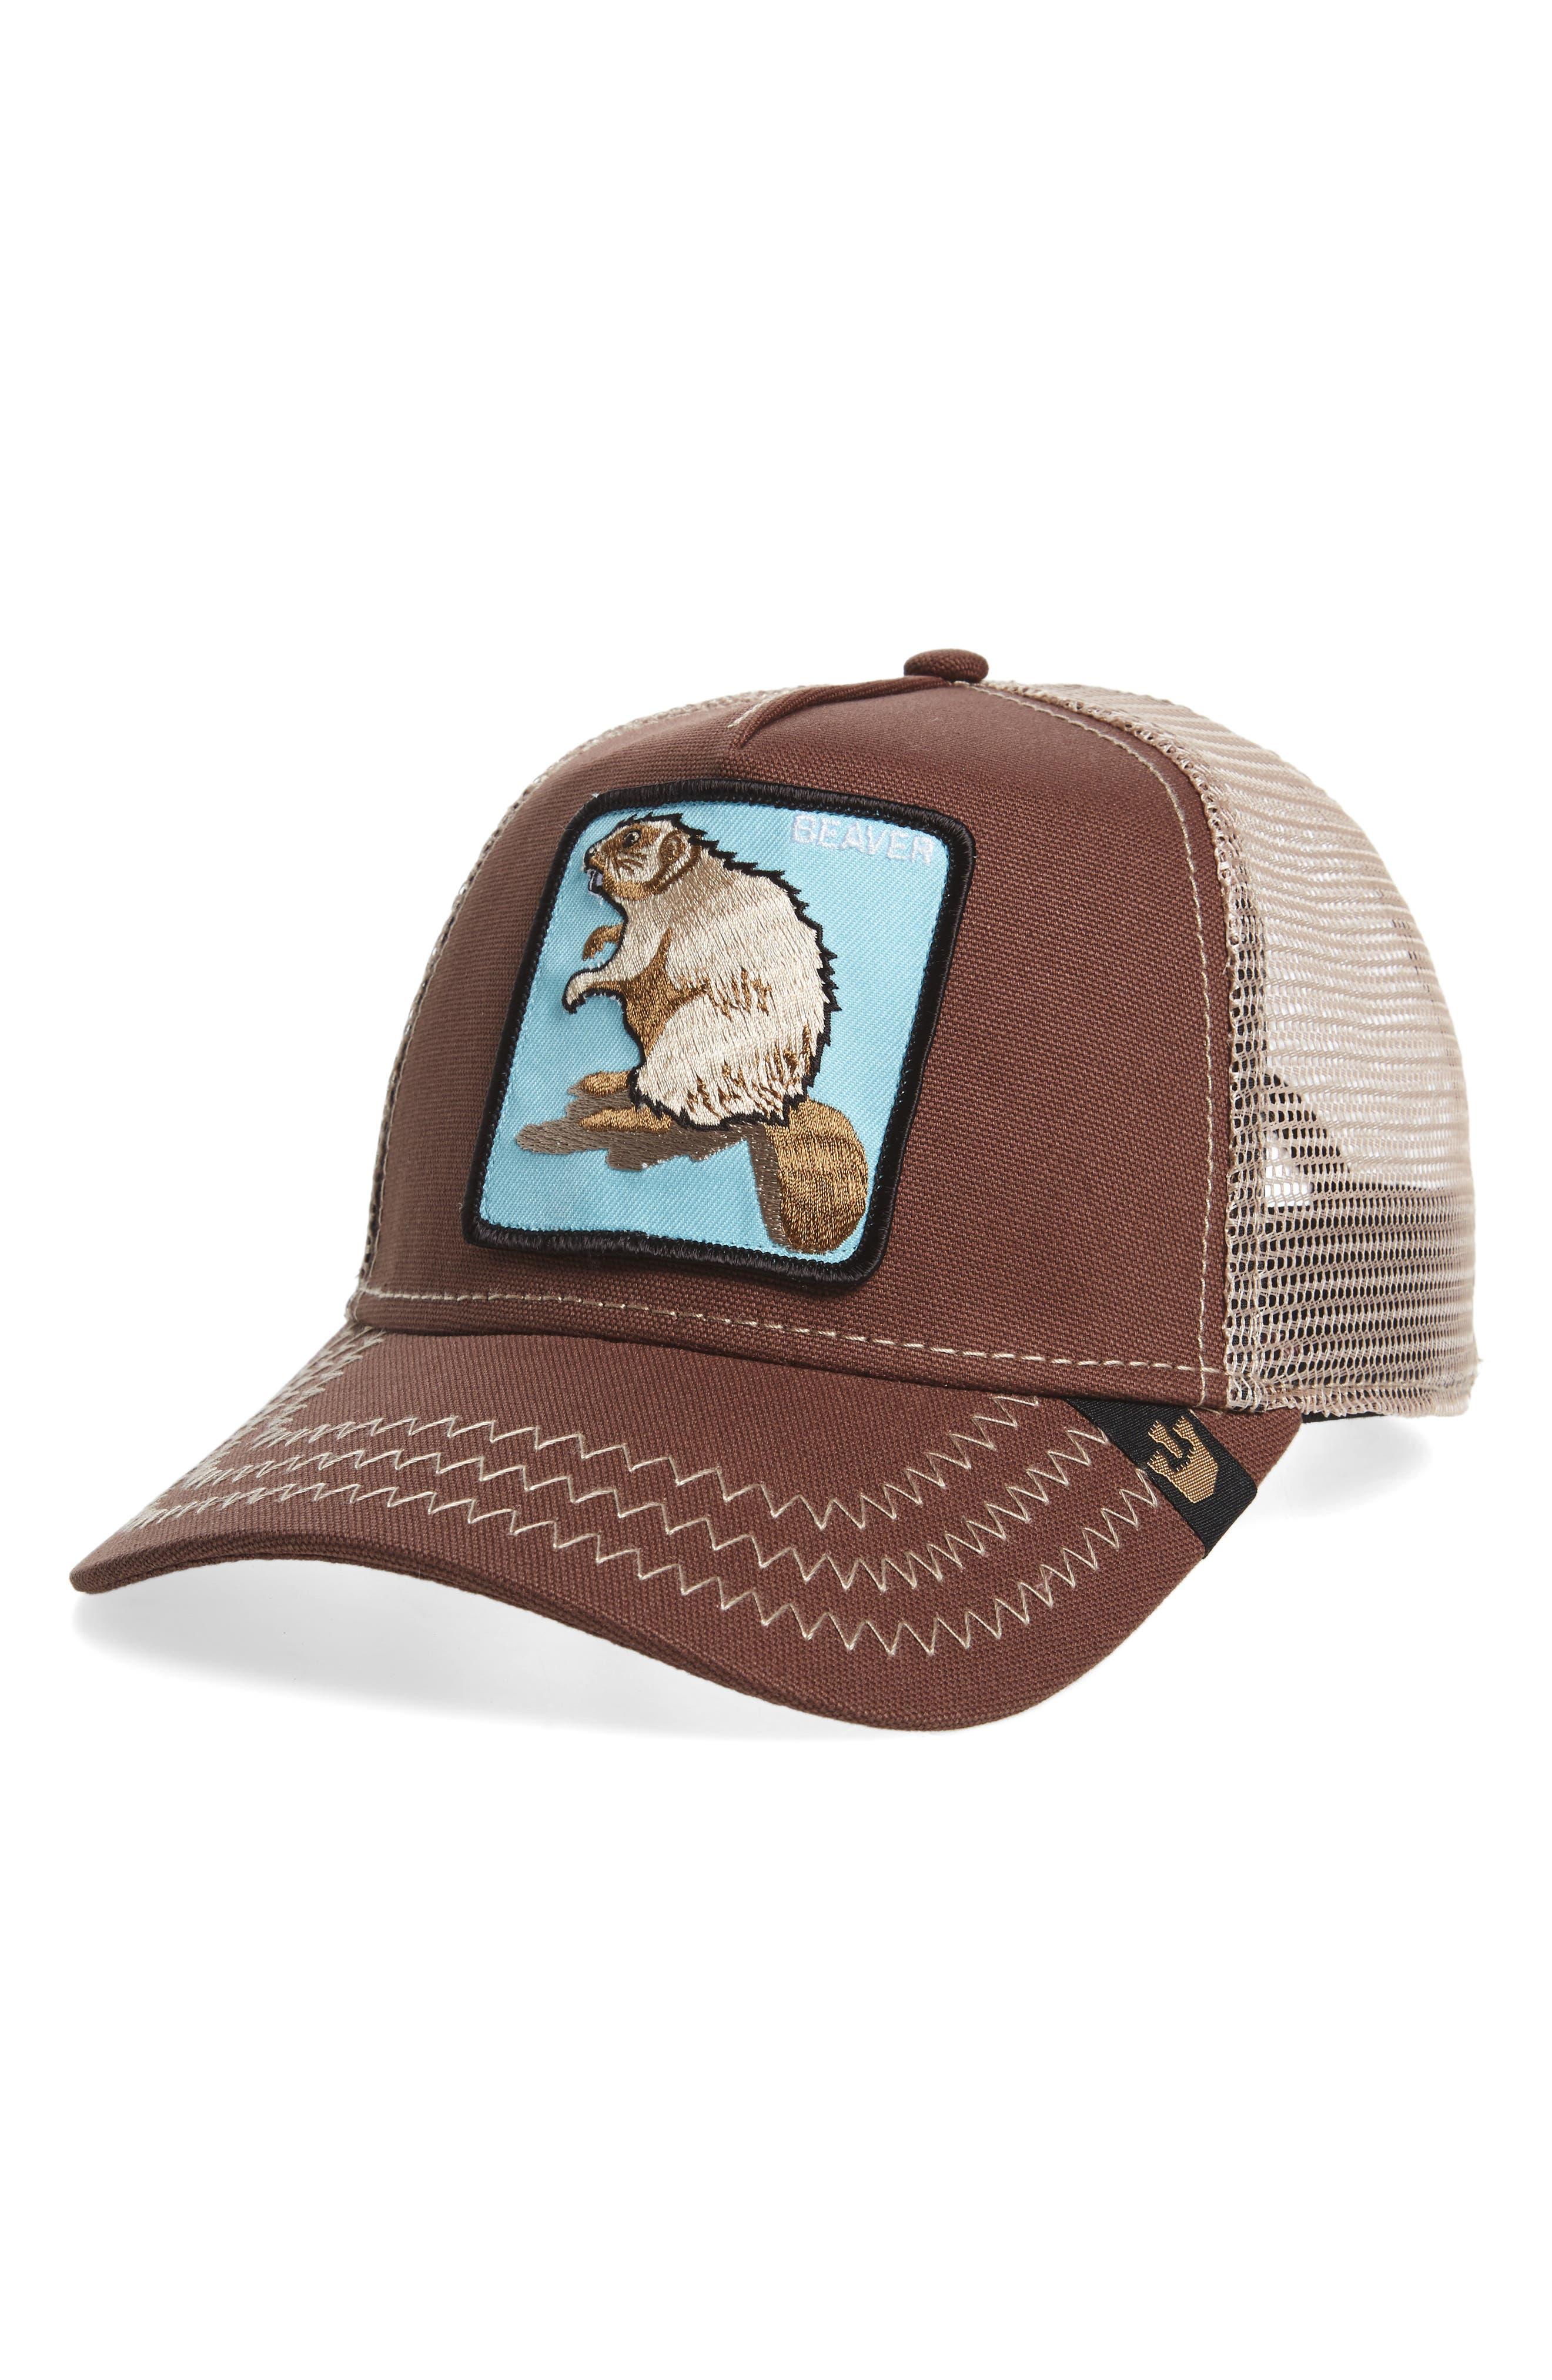 Animal Farm Beaver Mesh Trucker Hat,                             Main thumbnail 1, color,                             BROWN